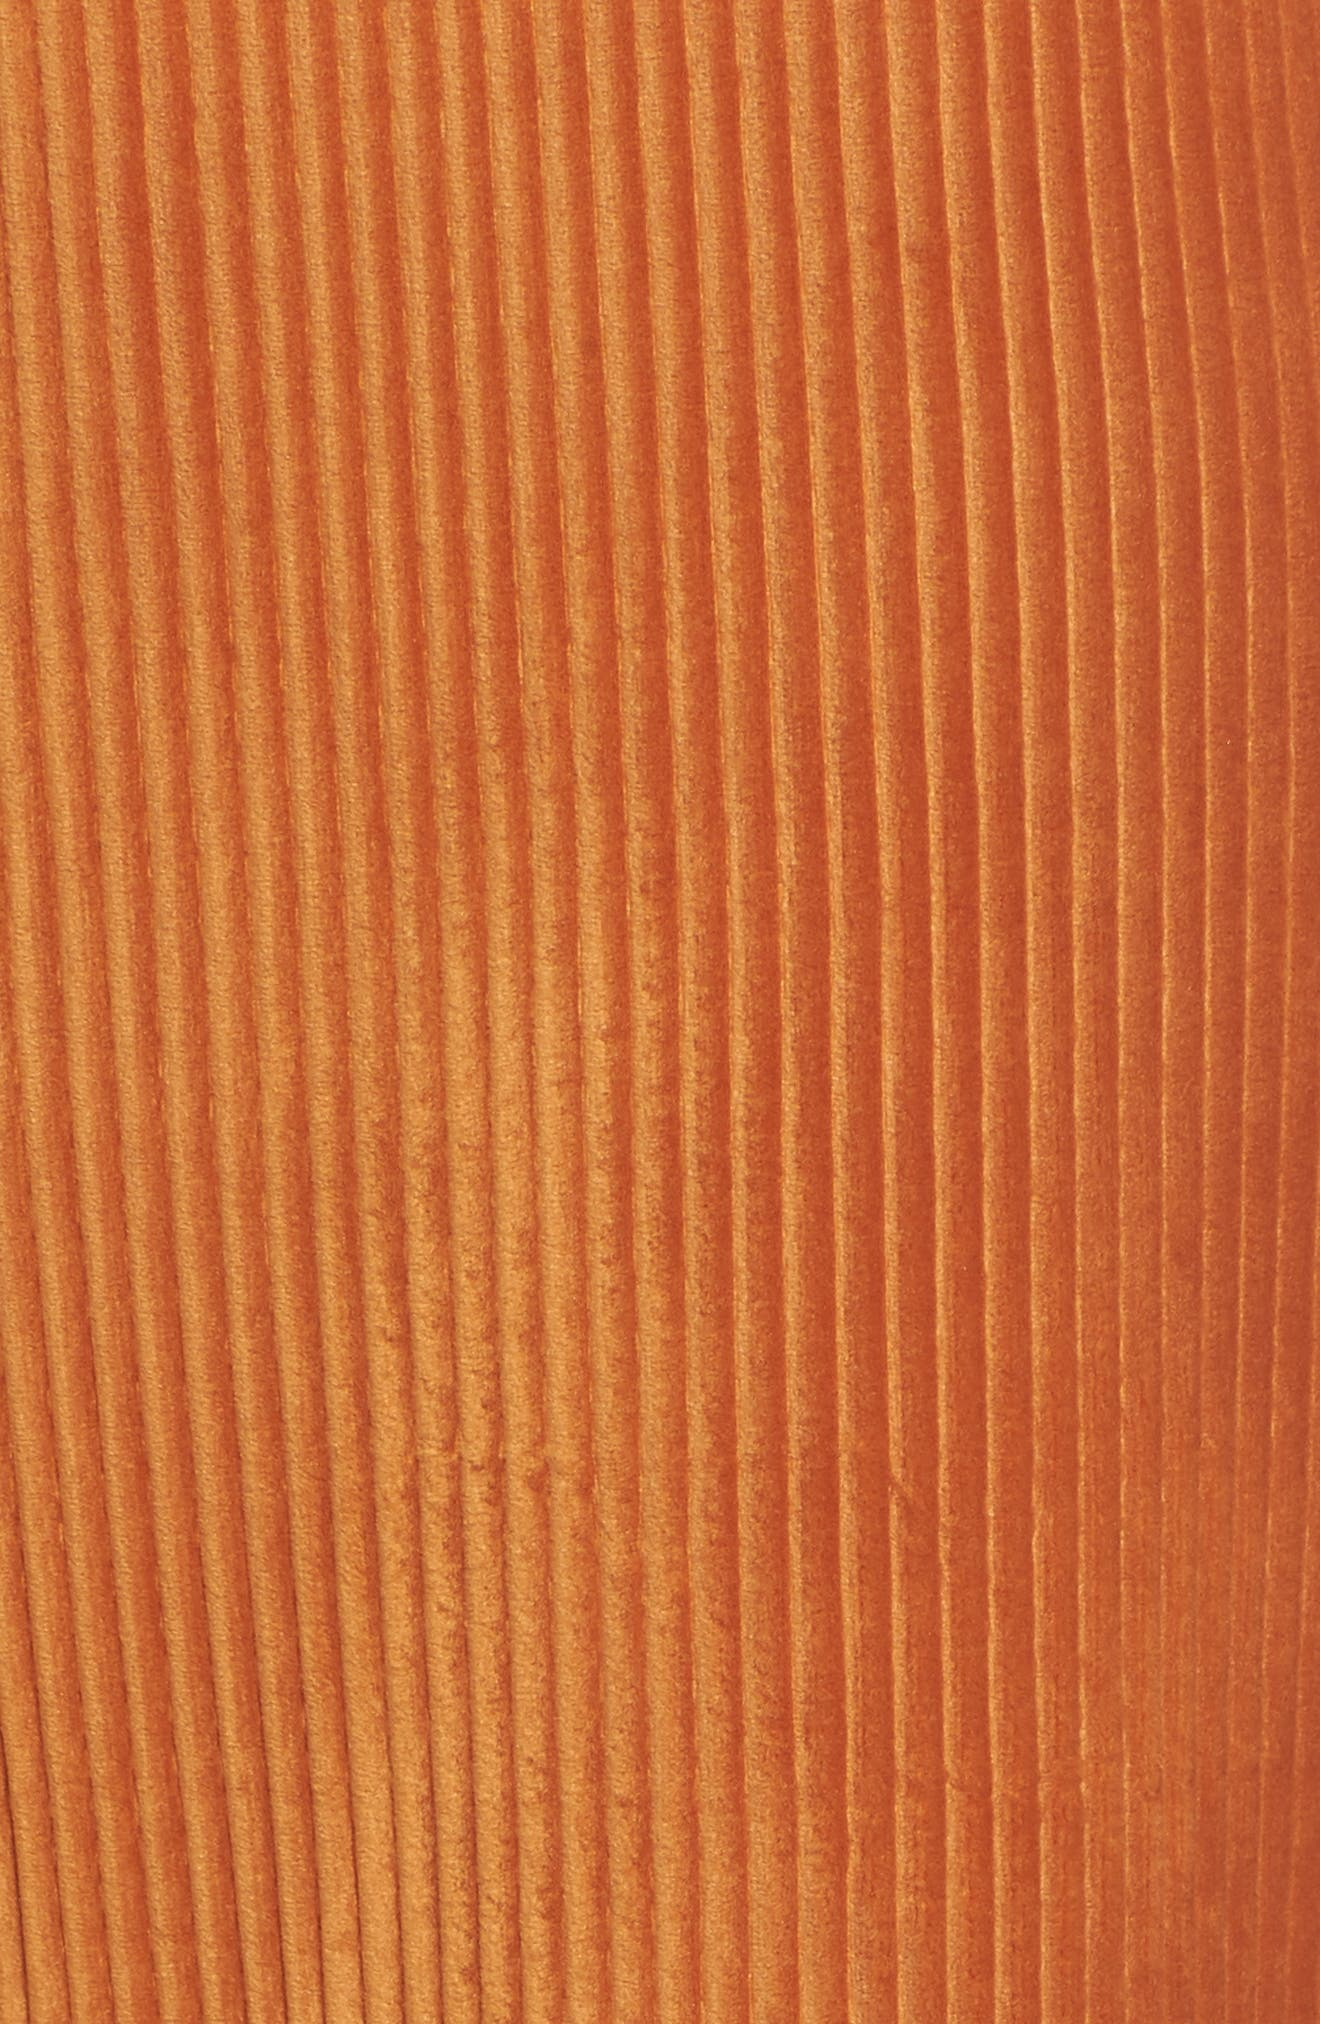 High Rise Knit Corduroy Crop Pants,                             Alternate thumbnail 7, color,                             RUST CIDER